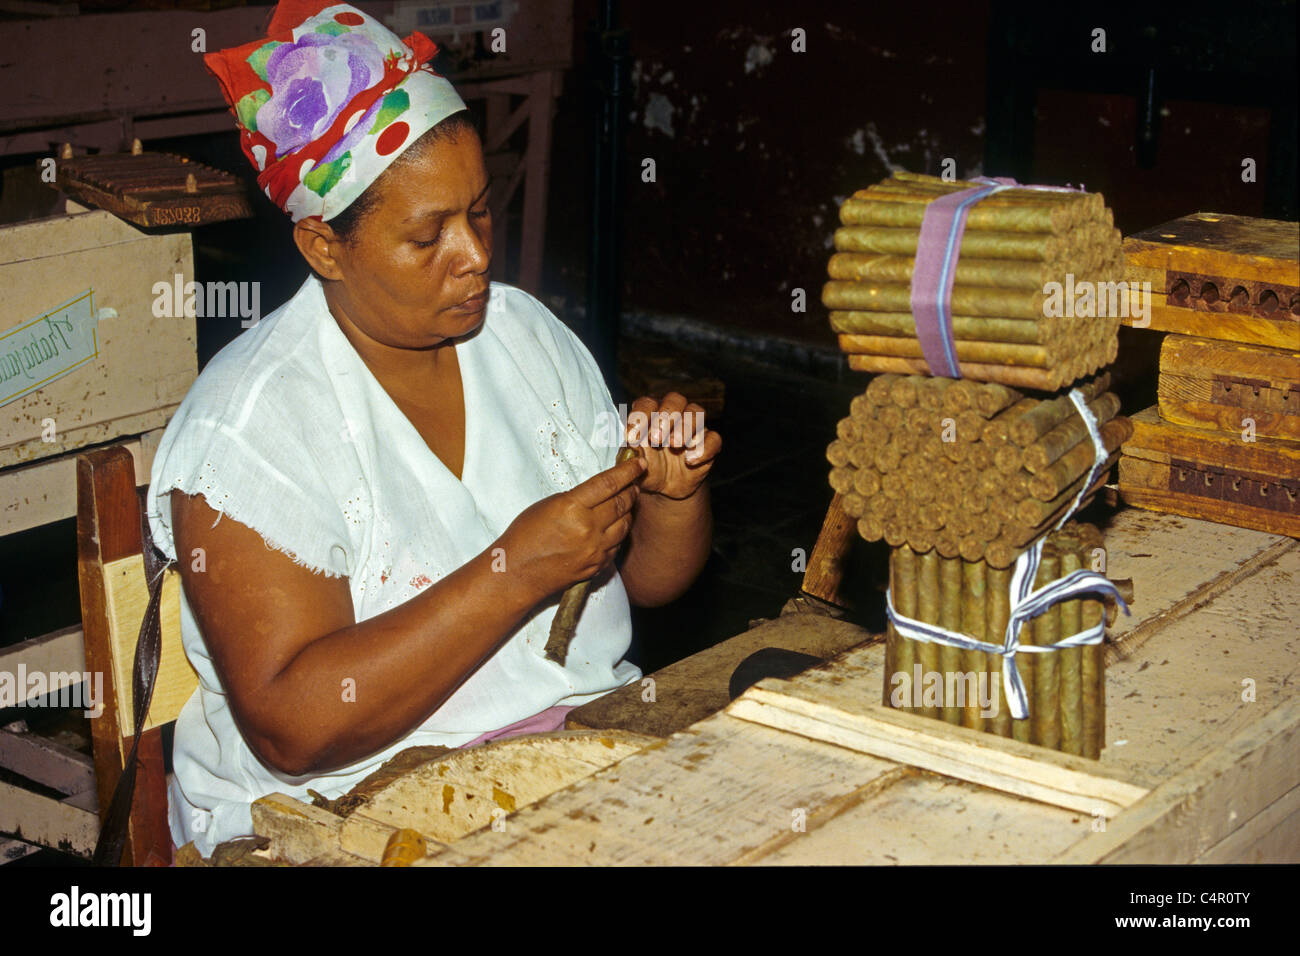 Kubanische Frau rolling Zigarren in Tabak Herstellung, Pinar del Rio, Kuba, Karibik Stockbild